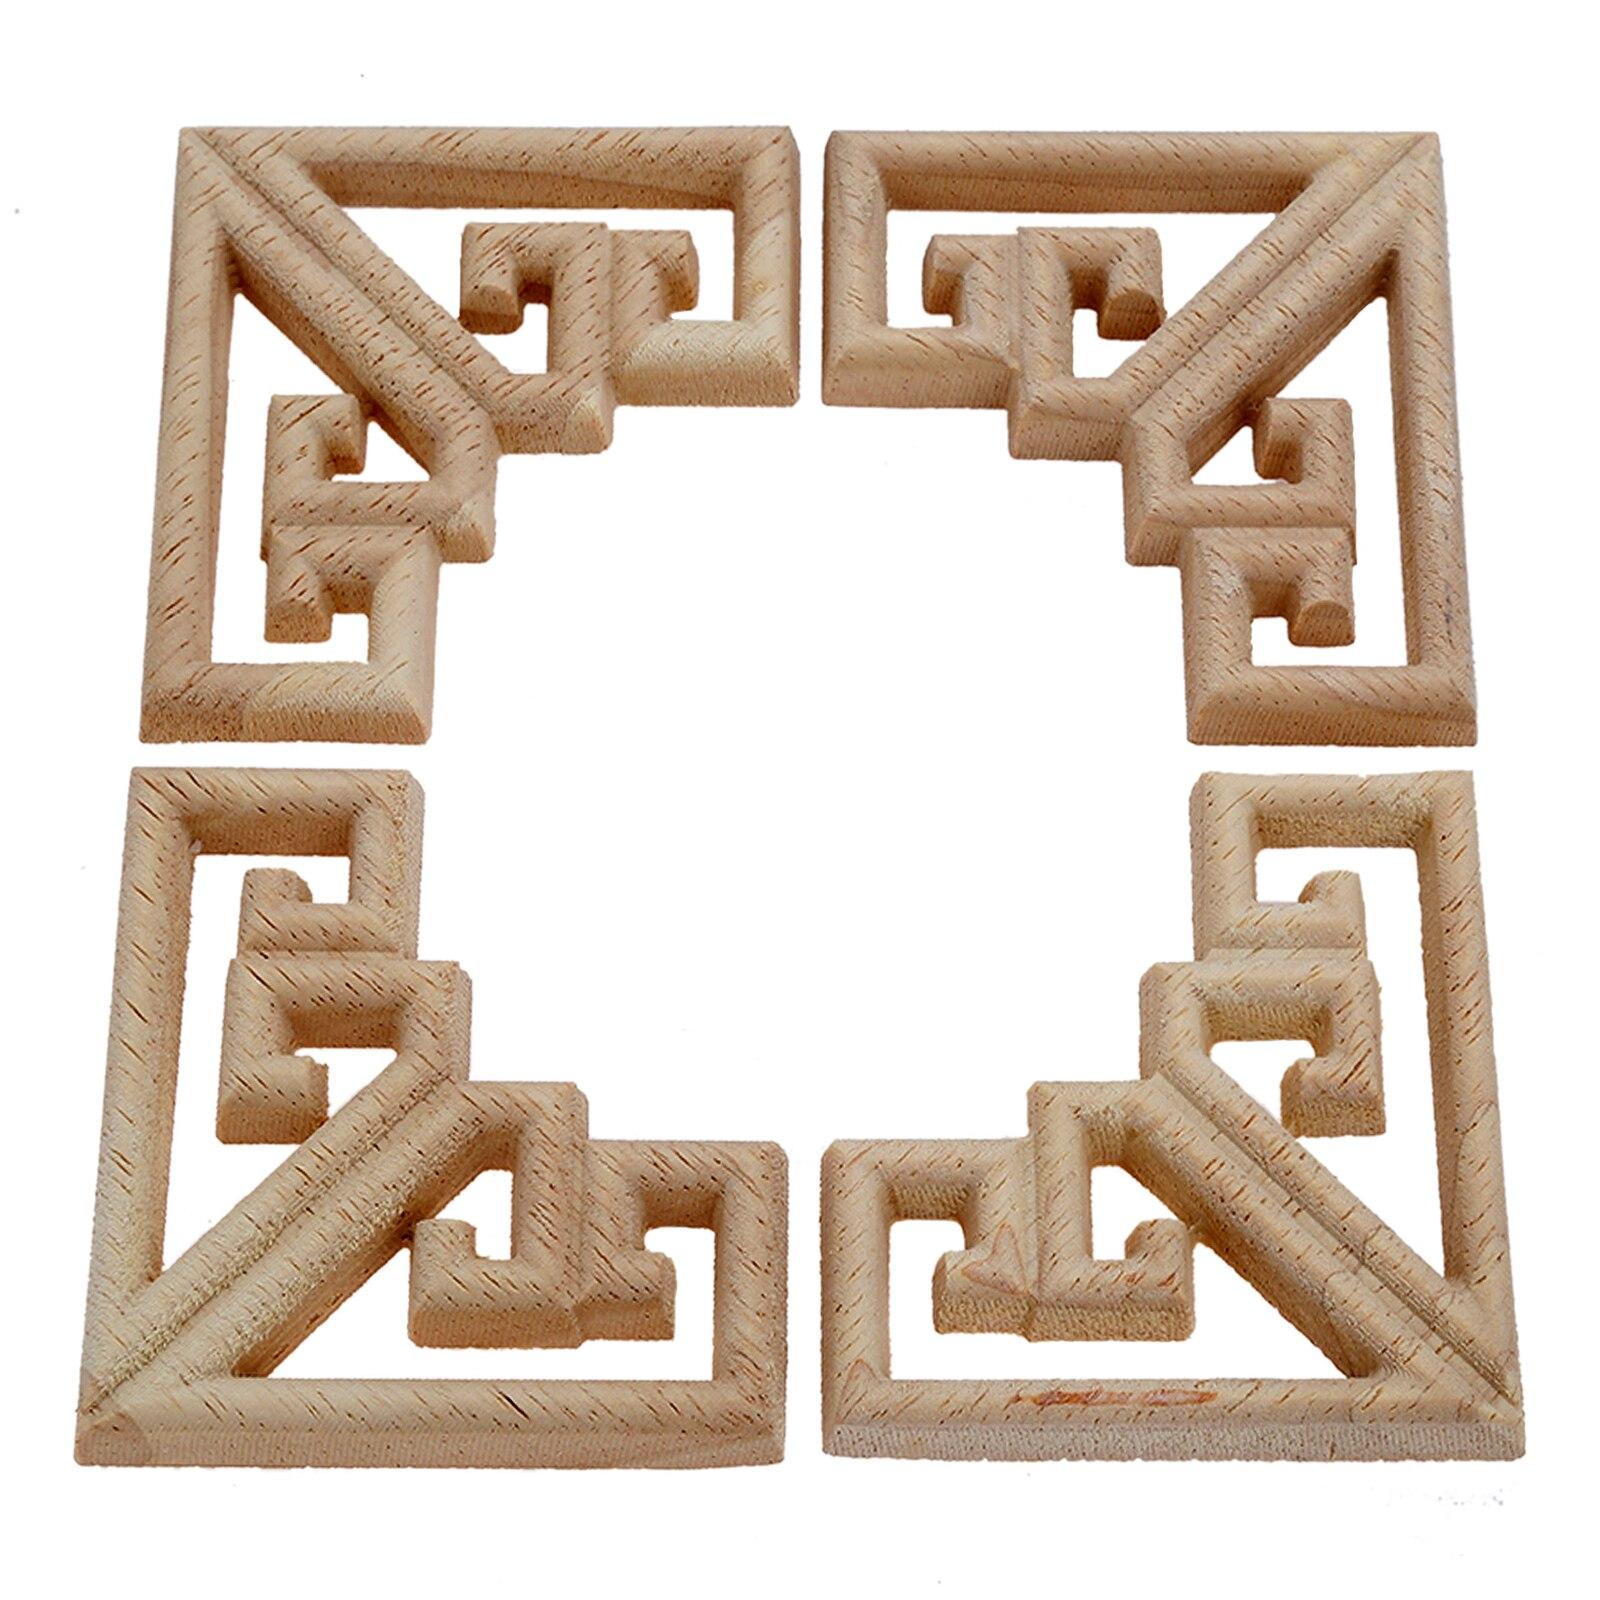 4PC 6.5cm Woodcarving Corner Decal Wood Figurines Crafts Corner Appliques Frame Door Furniture Woodcarving Decorative Home Decor